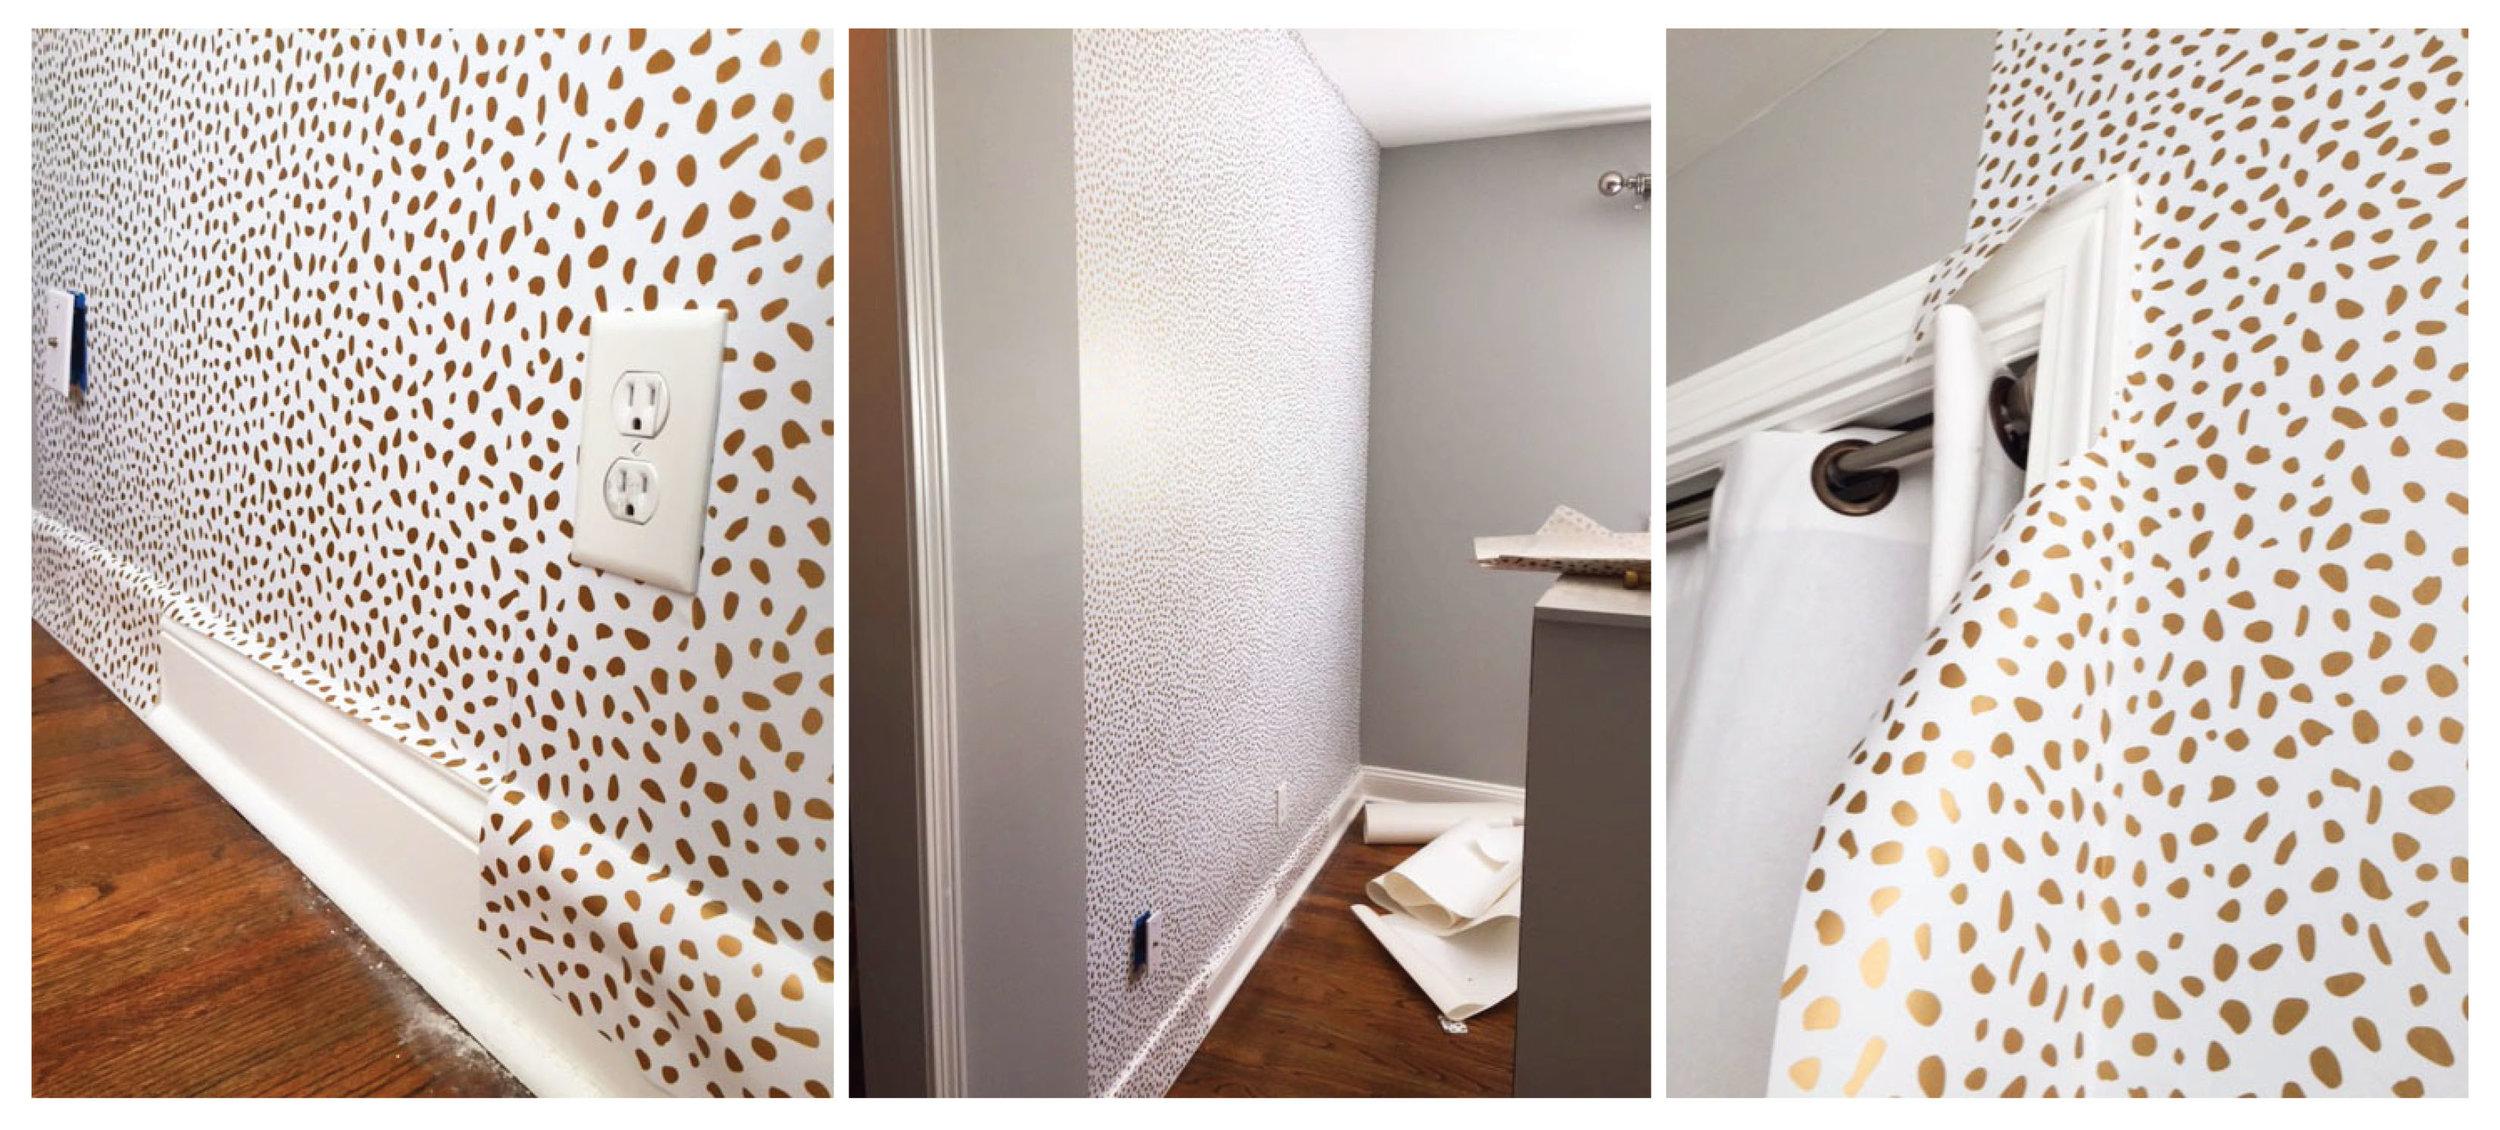 House Plus Love ORC Wallpaper Steps 2